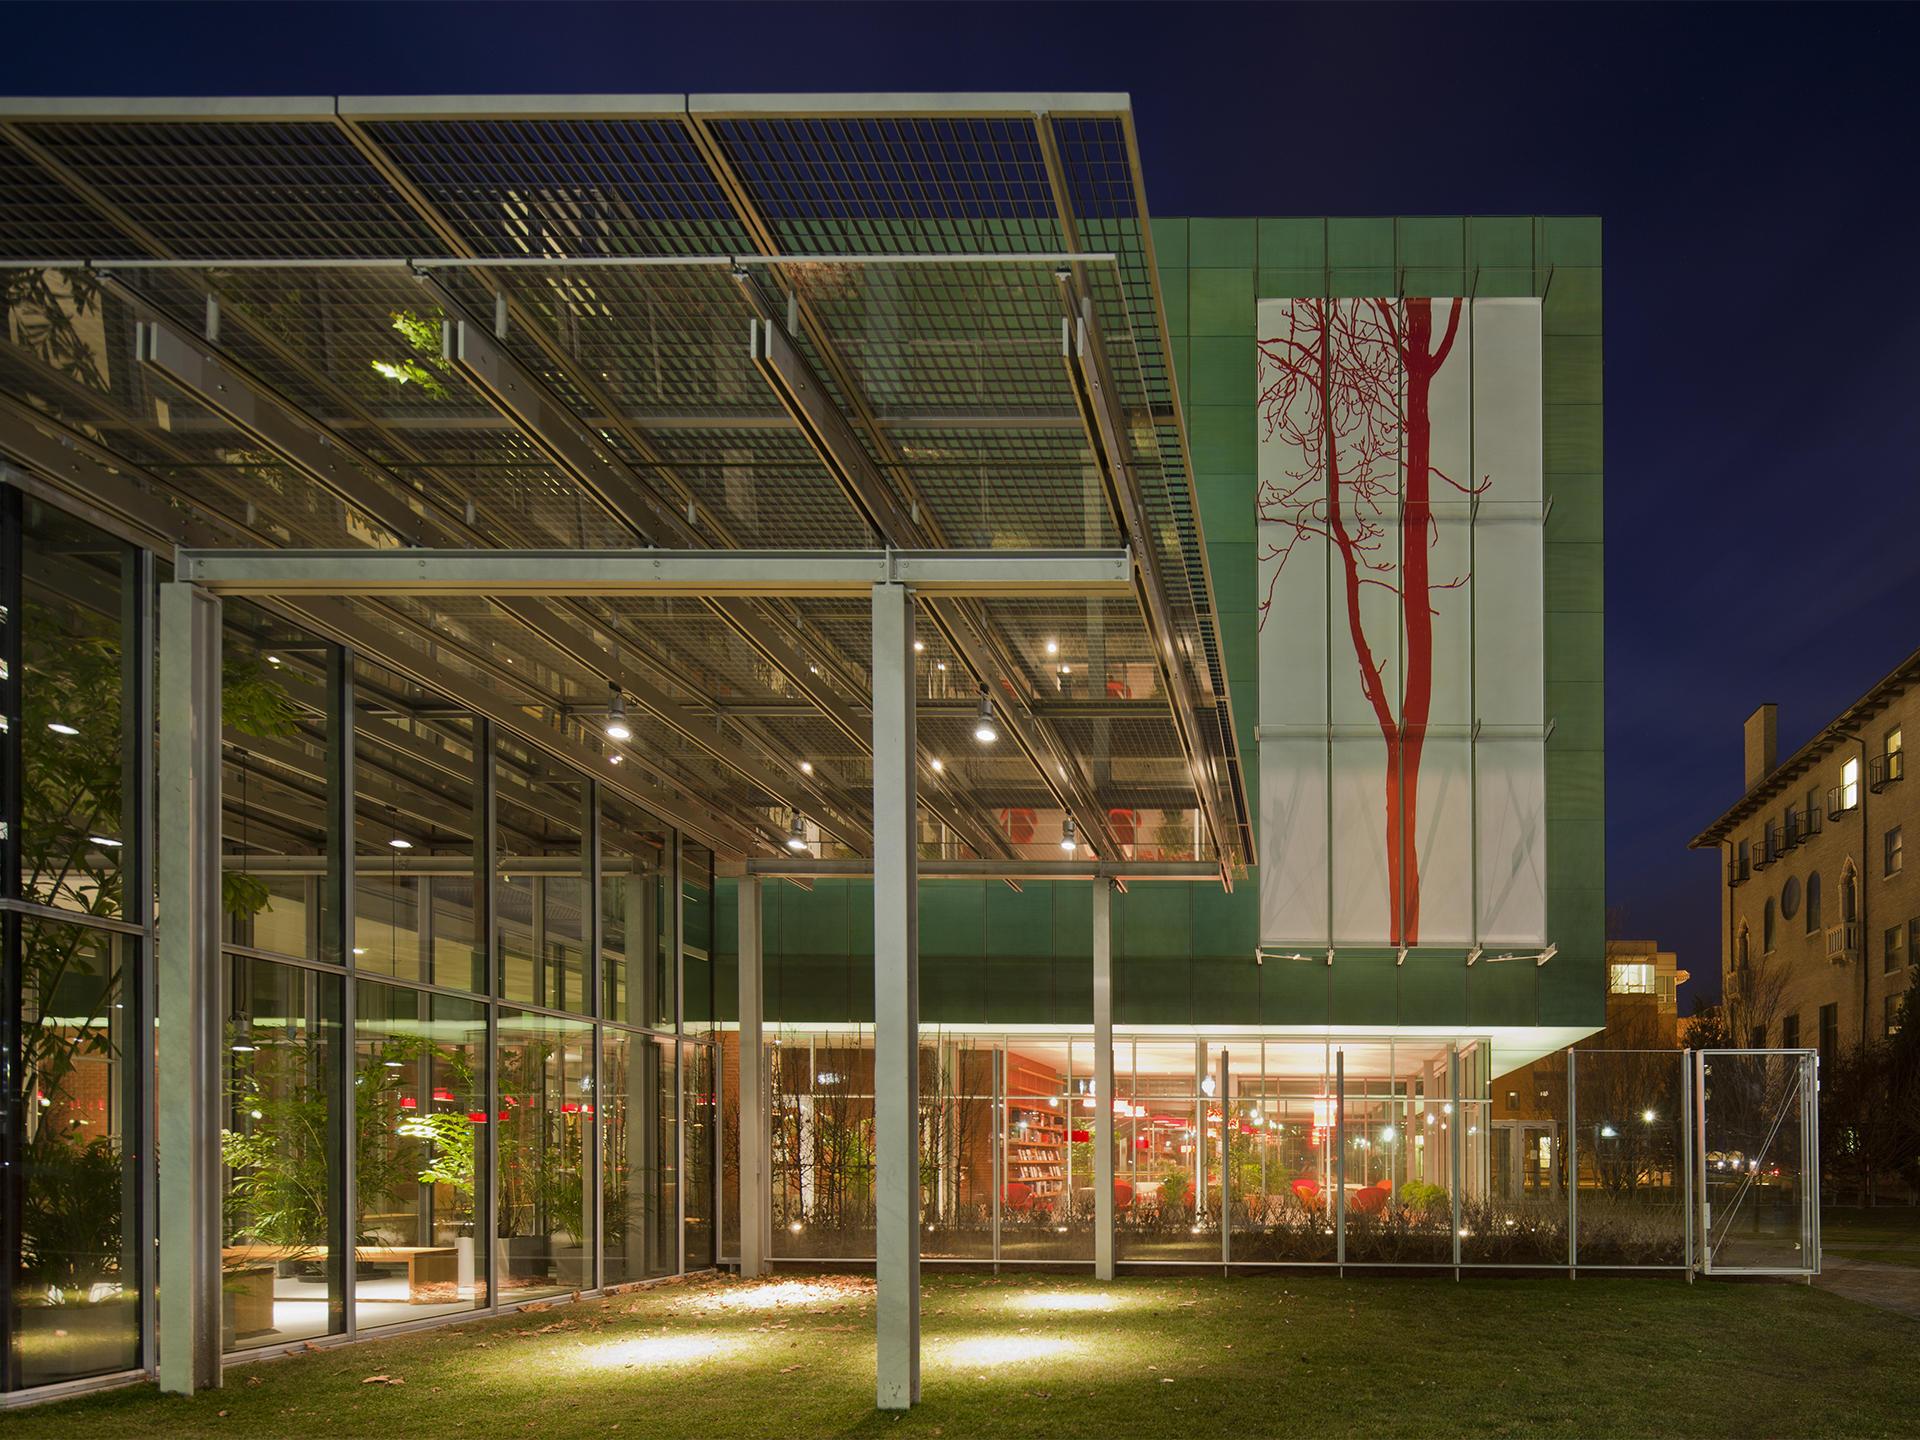 Arienti's Ailanthus façade piece, 2012